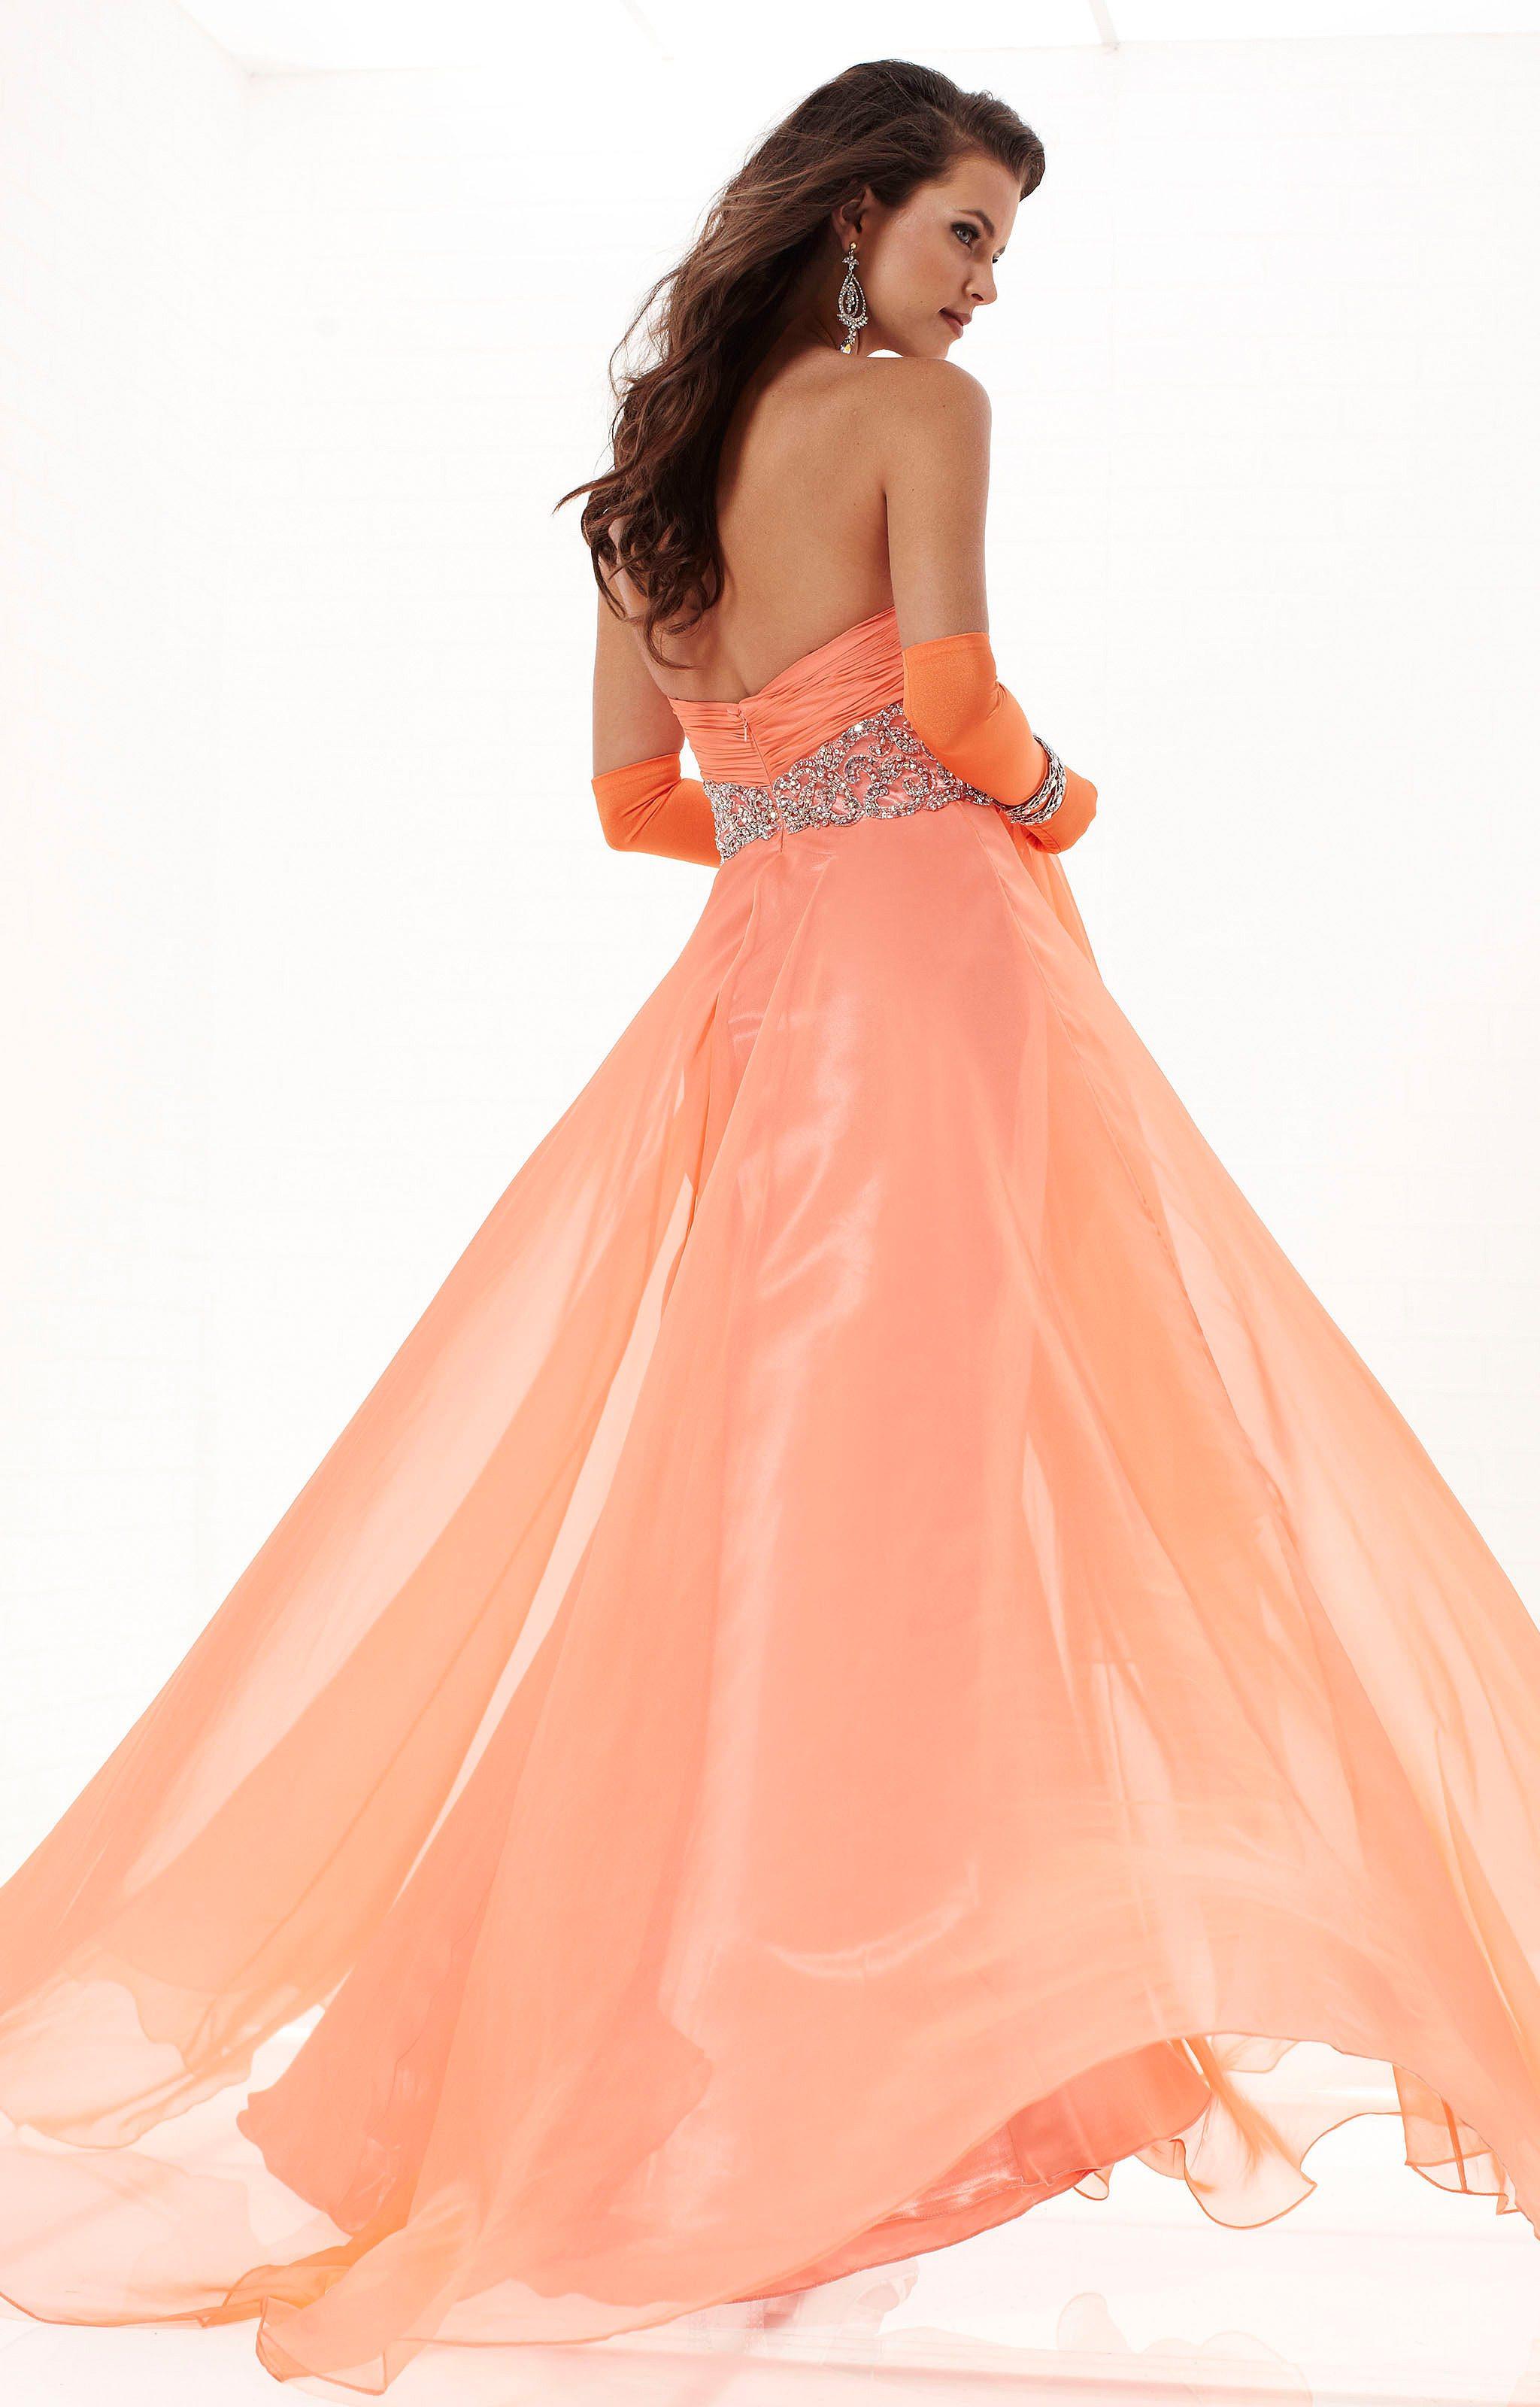 Tiffany Designs 16744 - Empire Waist Chiffon Dress Prom Dress